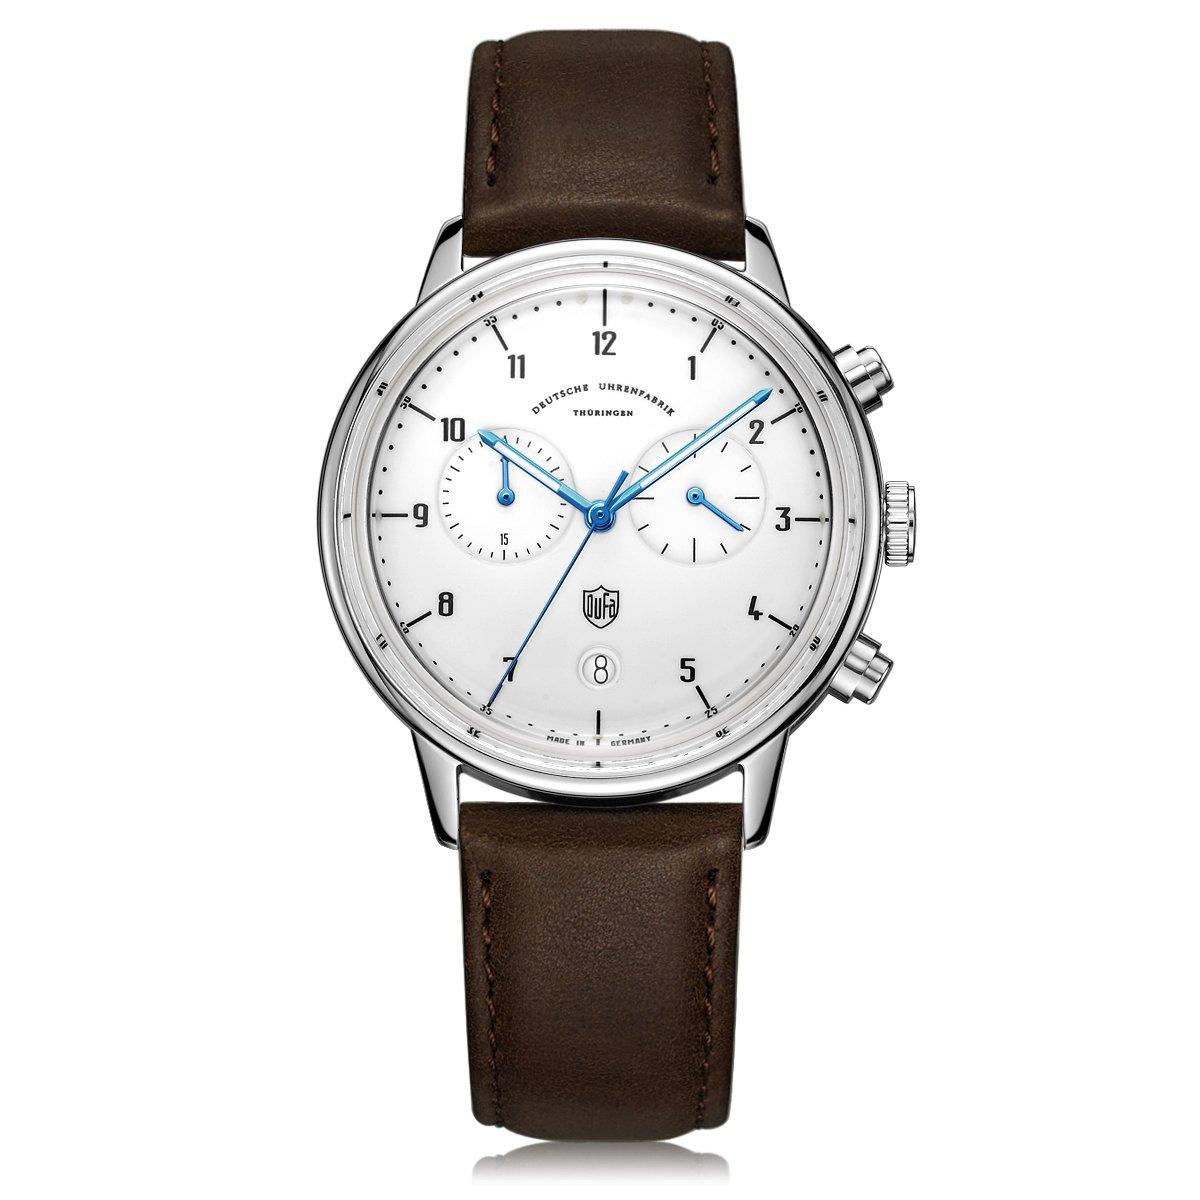 Df Quarz Dufa Armband Uhr 02 Unisex Leder 9003 Chronograph Mit cS5AL4q3Rj